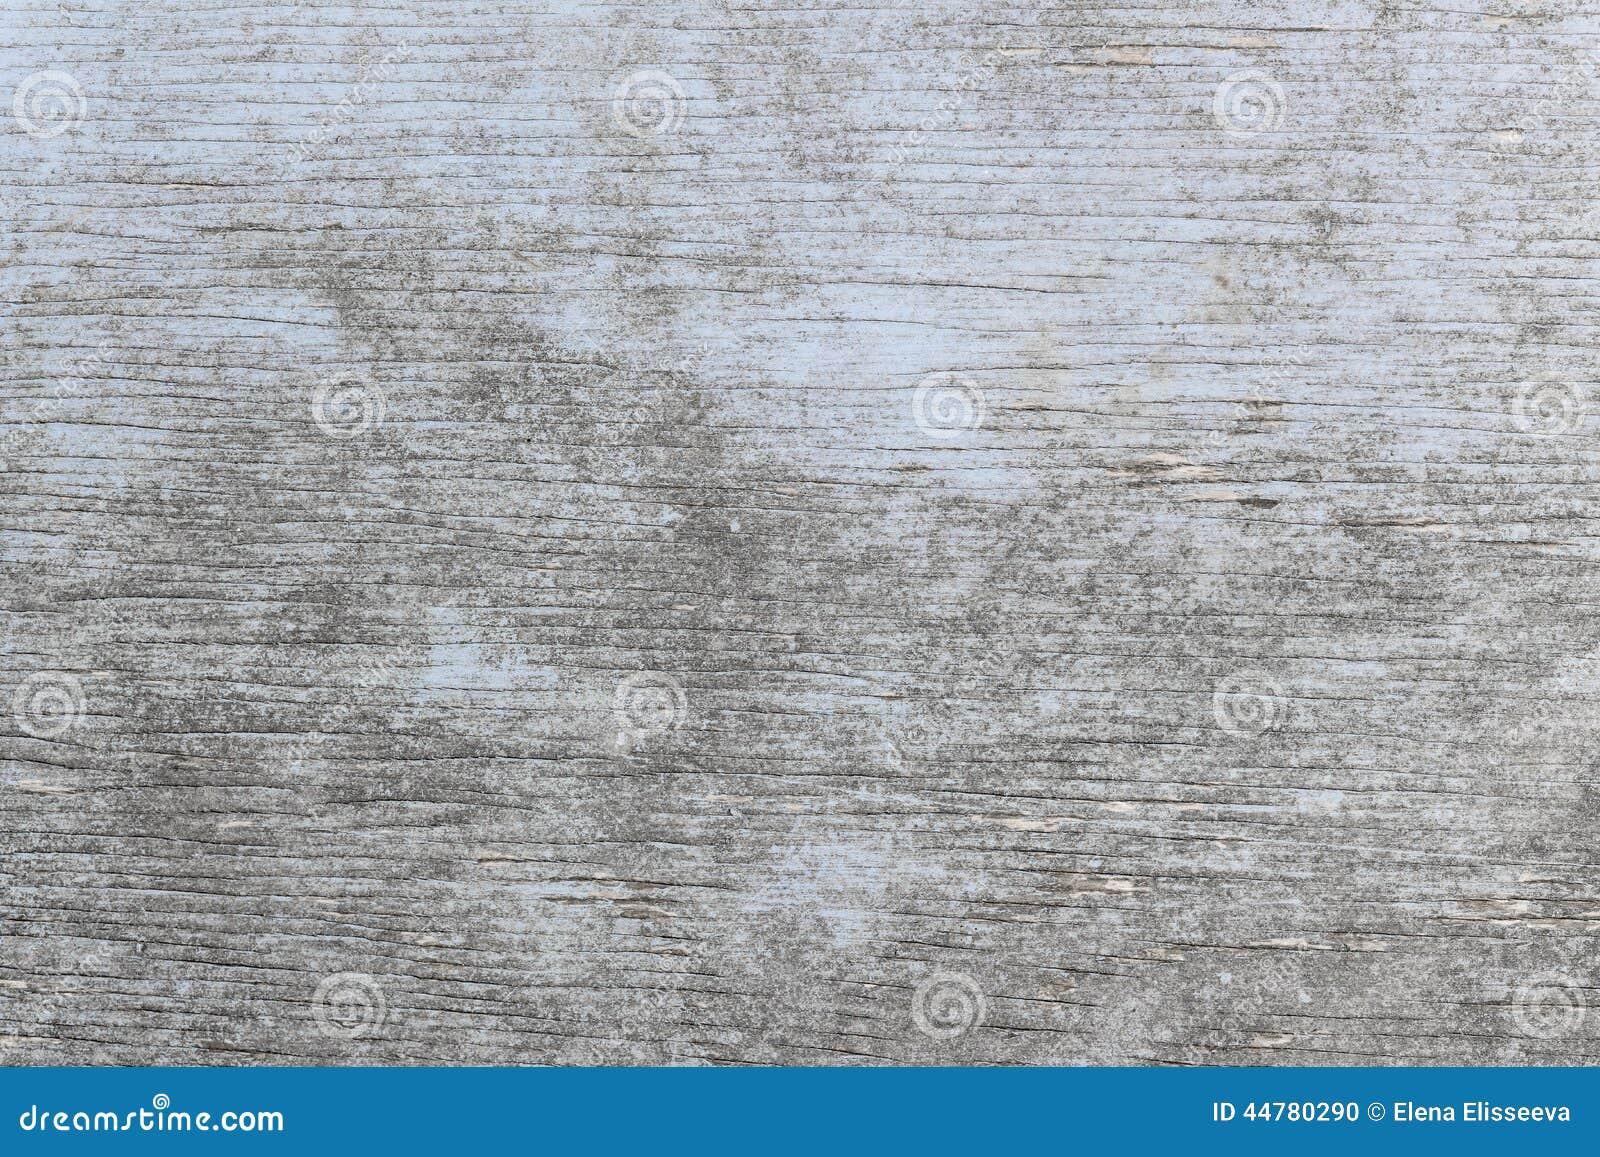 Dark Grey Painted Fence